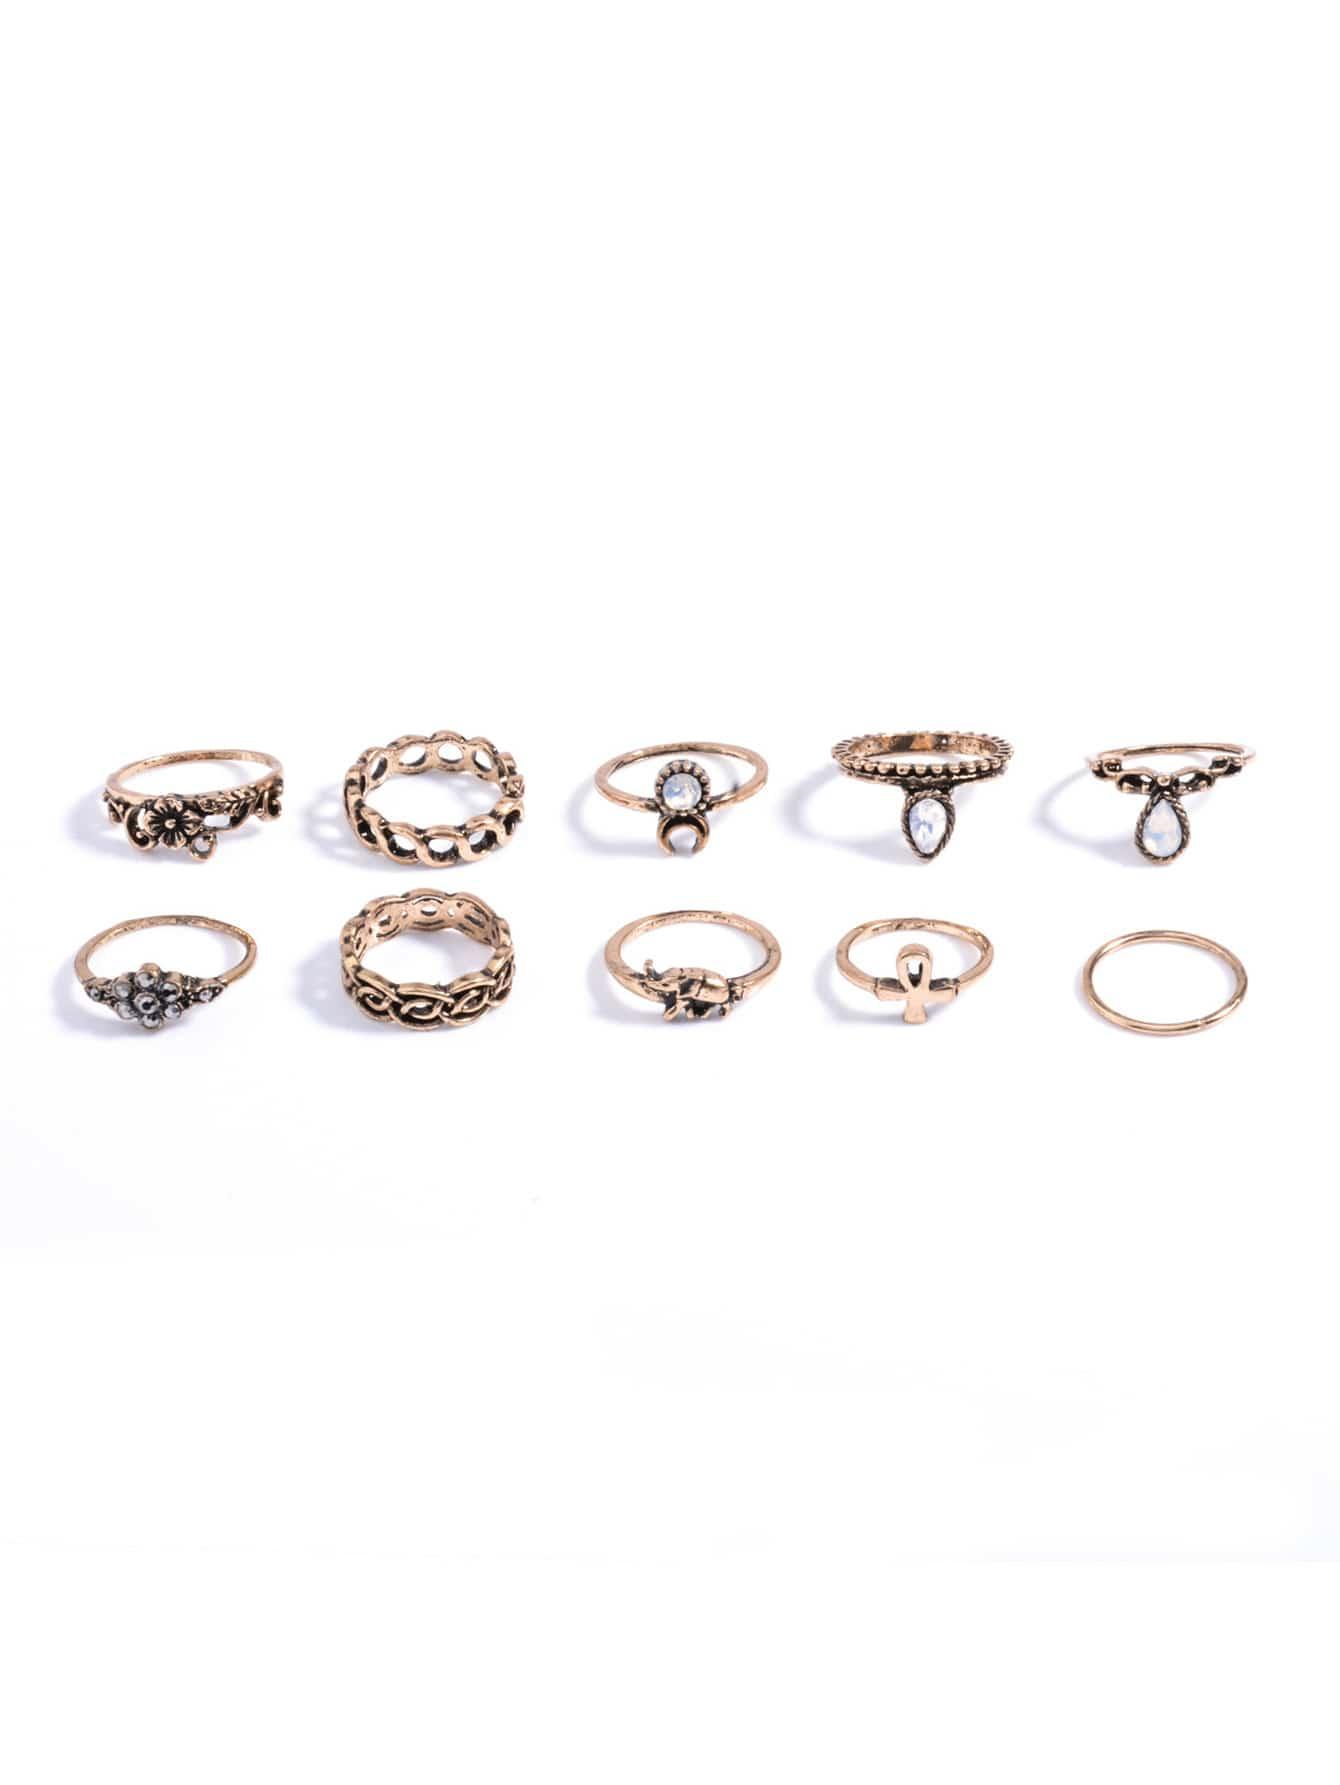 Rhinestone Ring Pack 10pcs